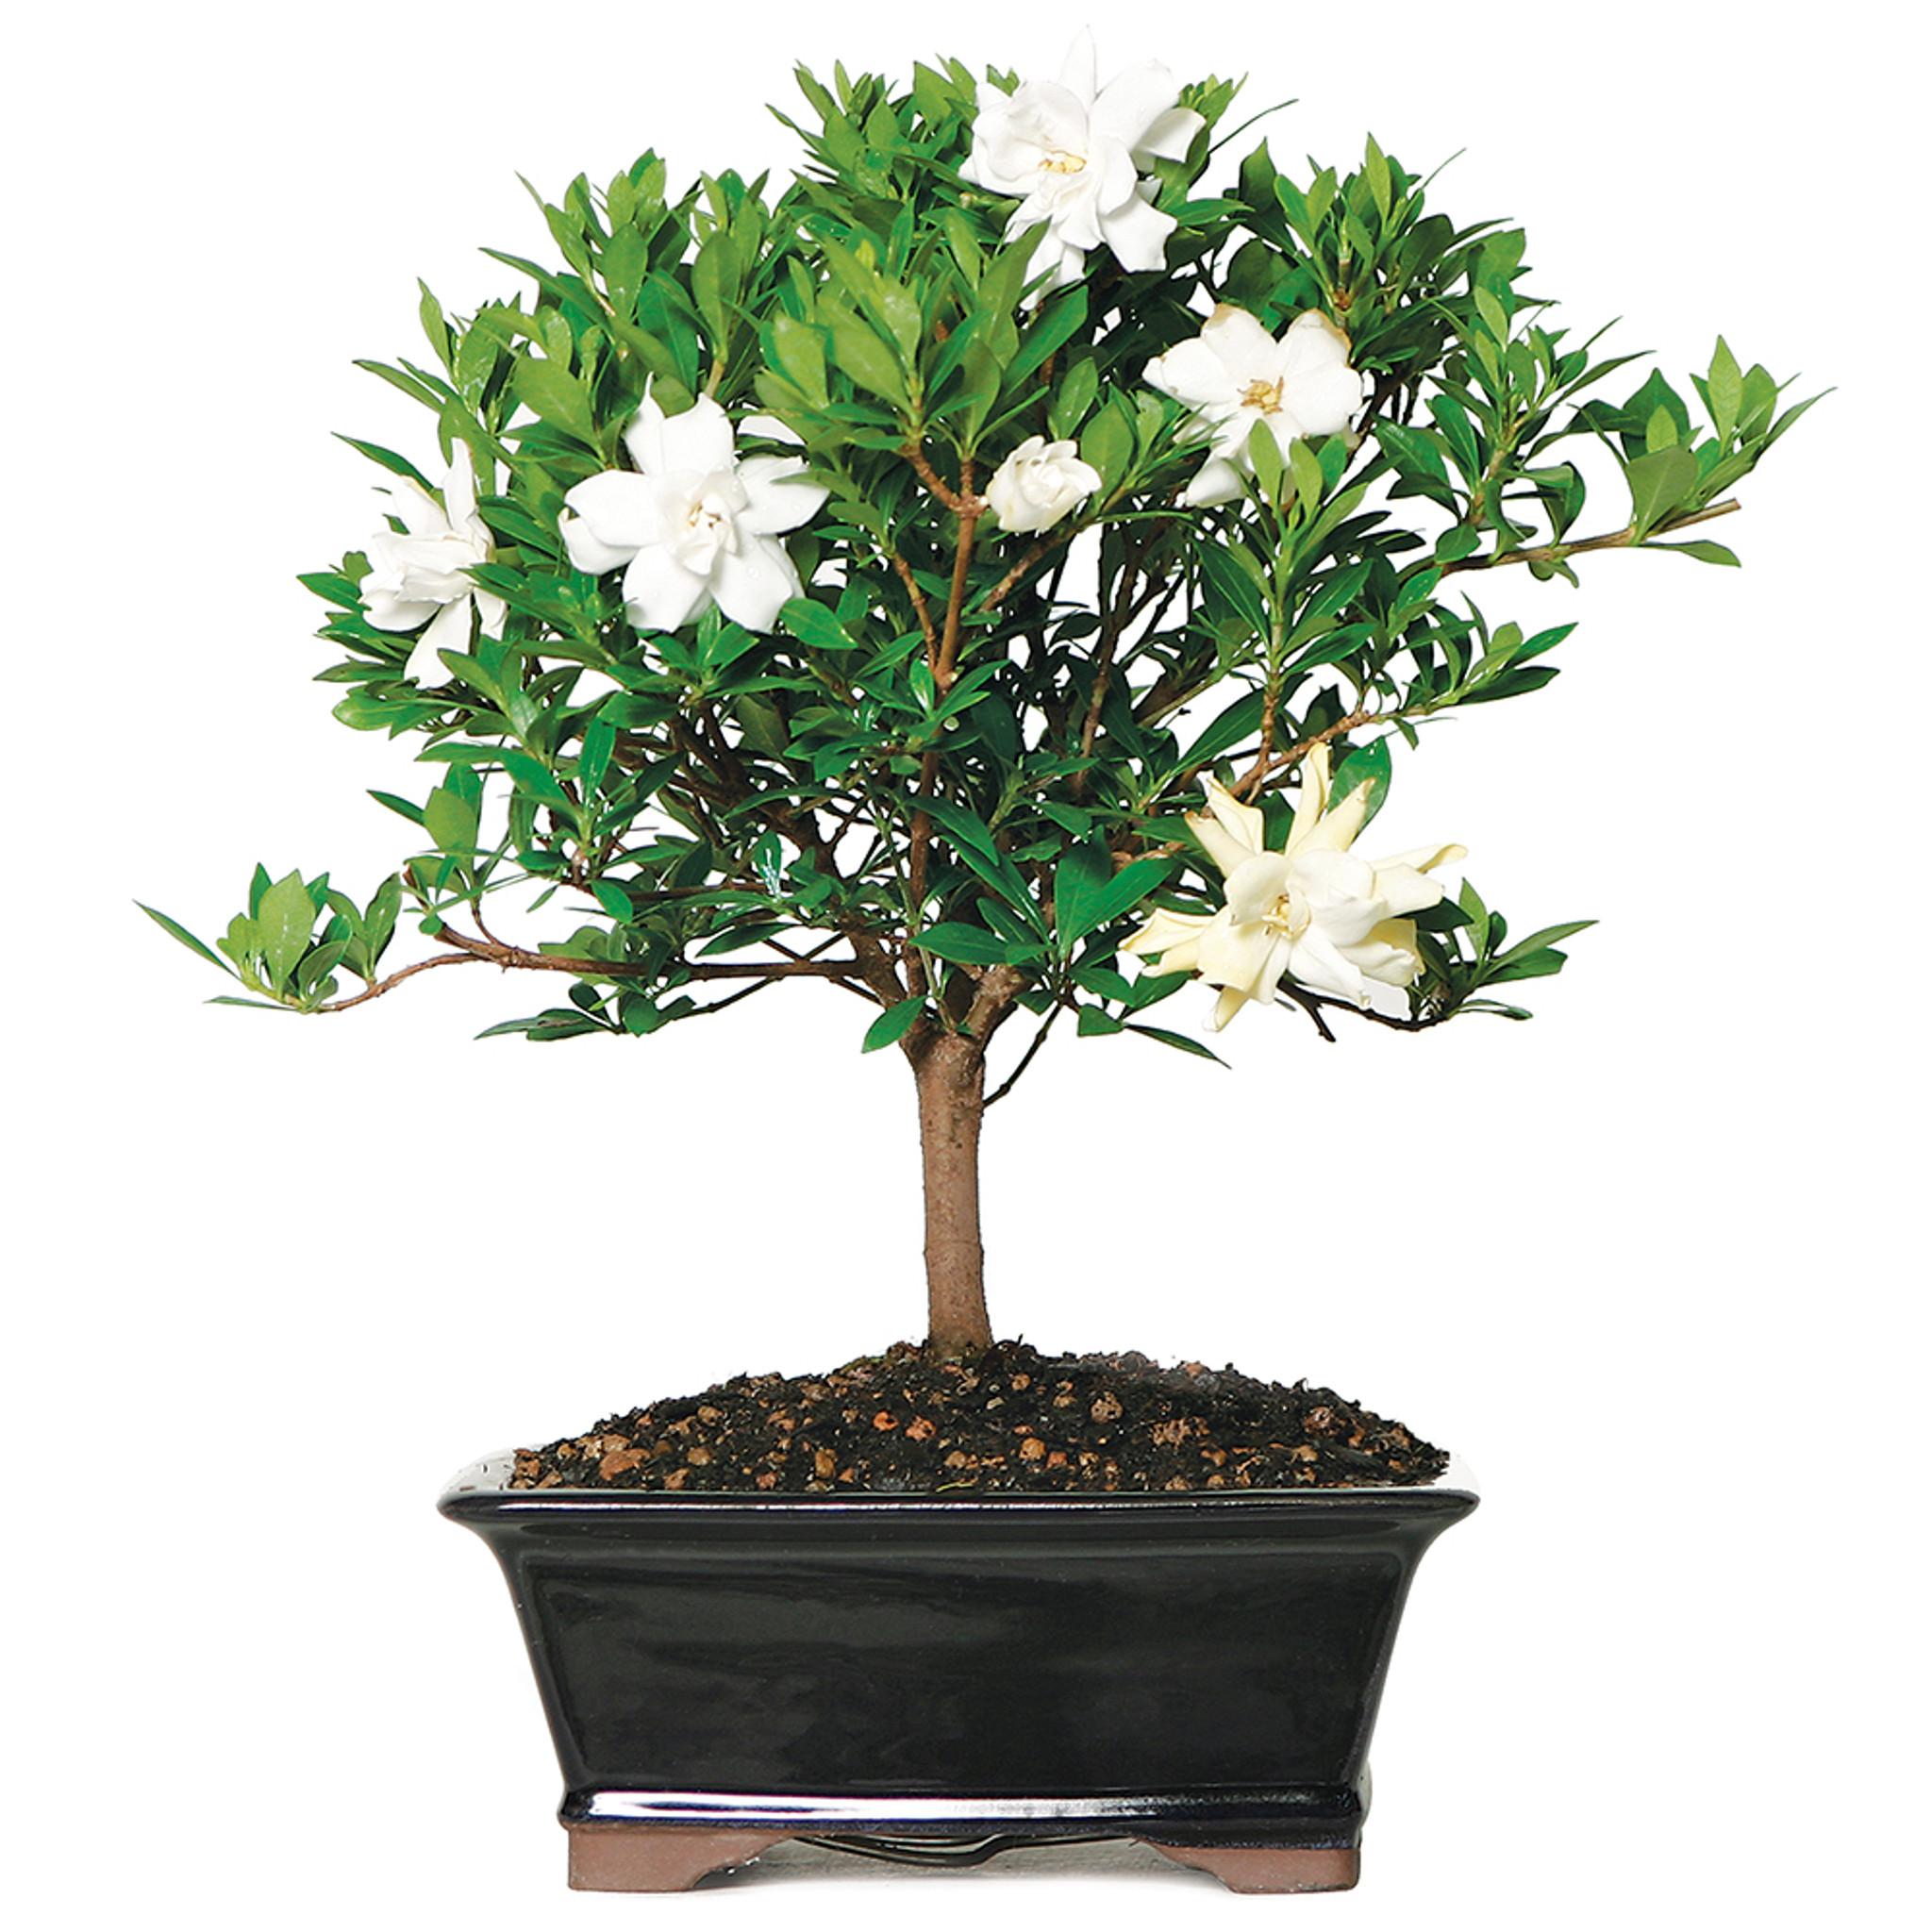 Gardenia Jasminoidy Radicans Outdoor Bonsai 8 12 Brussel S Bonsai